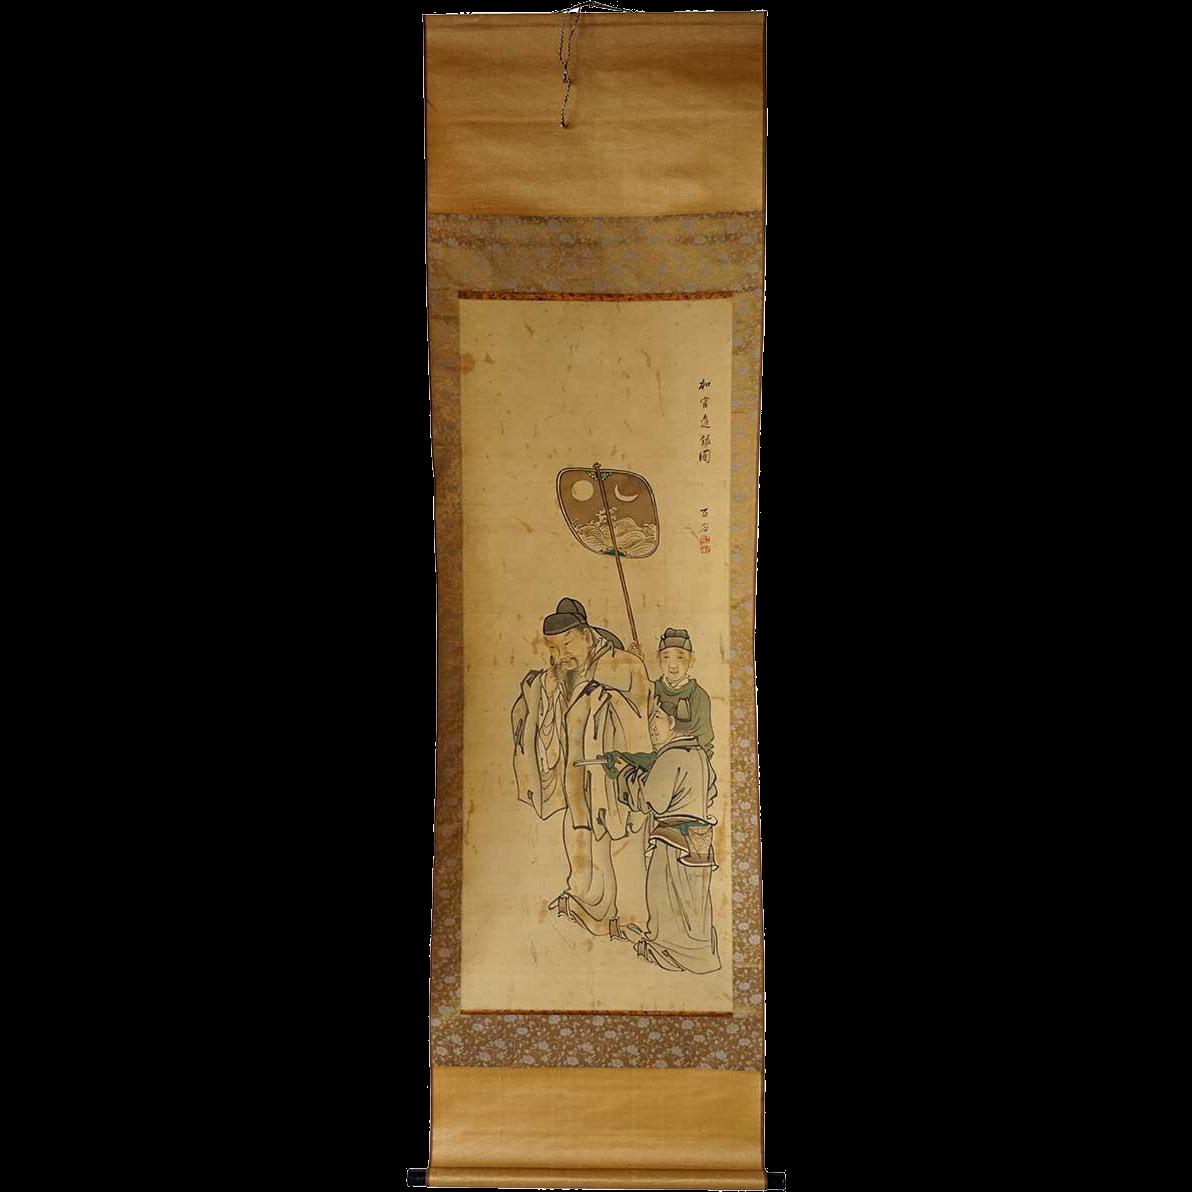 Vintage Japanese Watercolor and Ink Brush Hanging Scroll Painting (Kakejiku)